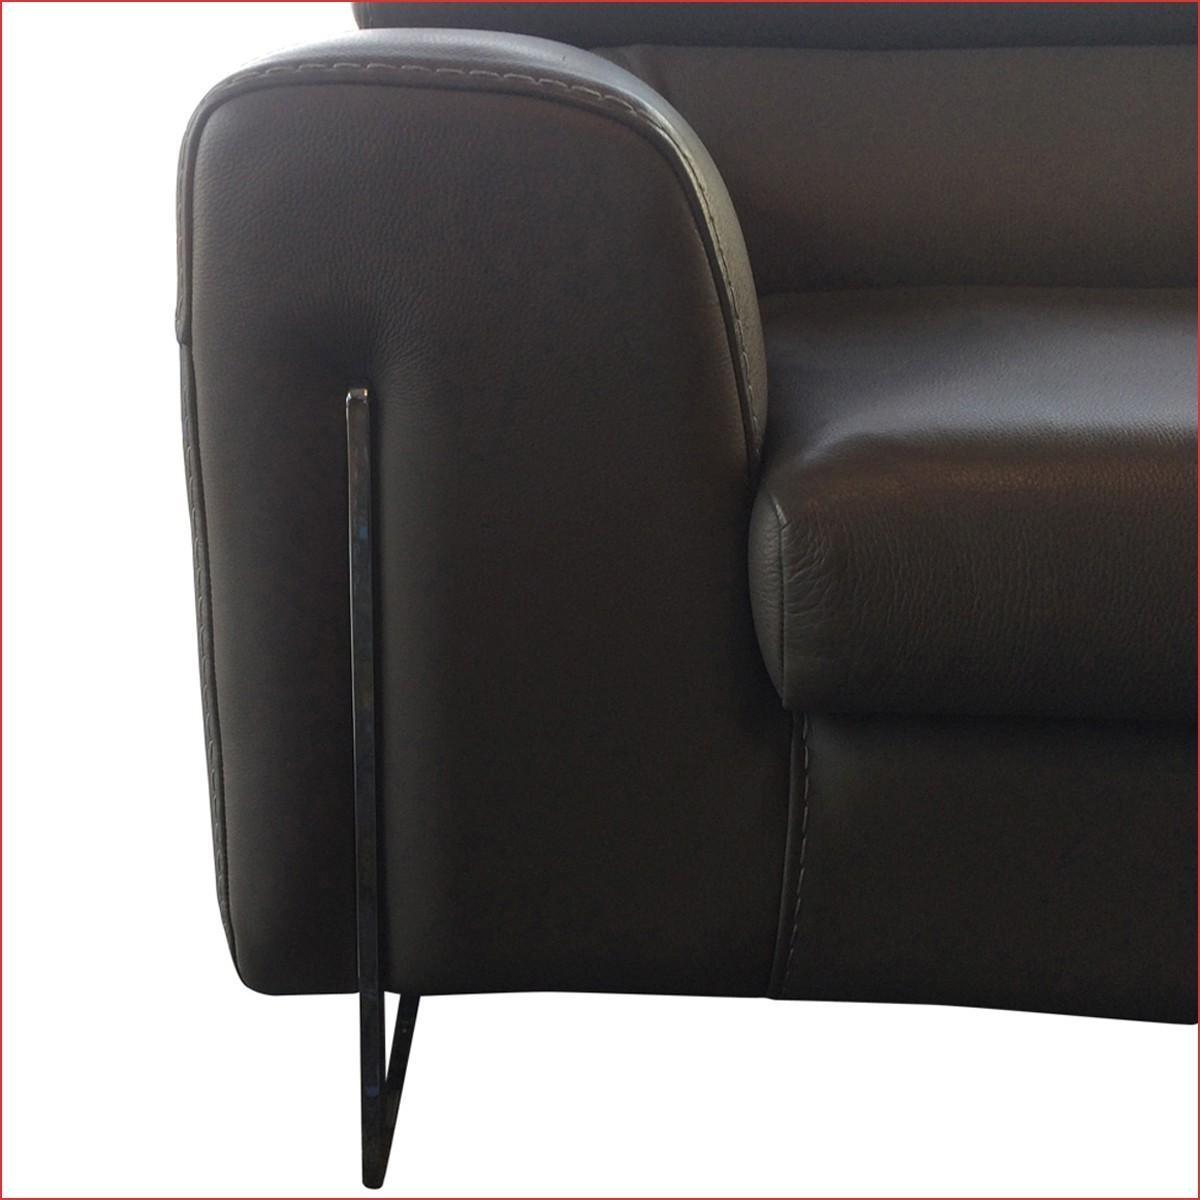 Cantoni Sofa Unique Designer Furniture Seating Cantoni Italian Within Cantoni Sofas (View 18 of 20)